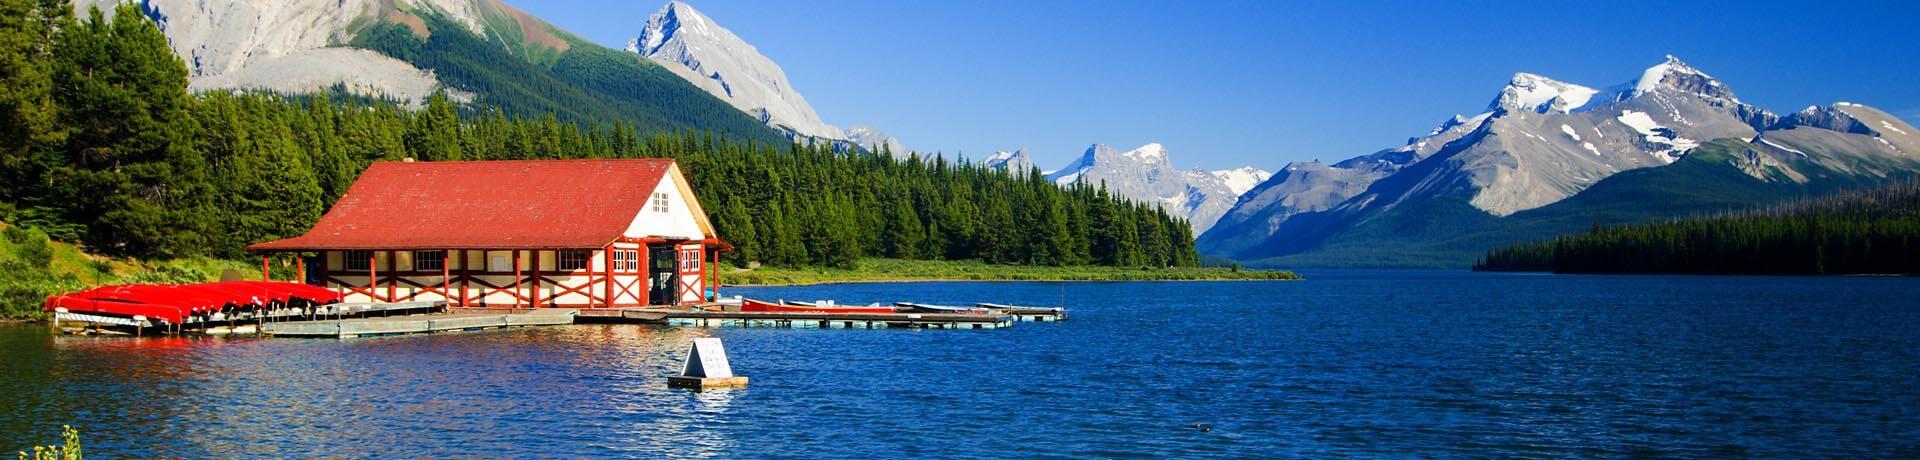 Maligne Lake and Maligne Mountain, Jasper, Canadian Rockies